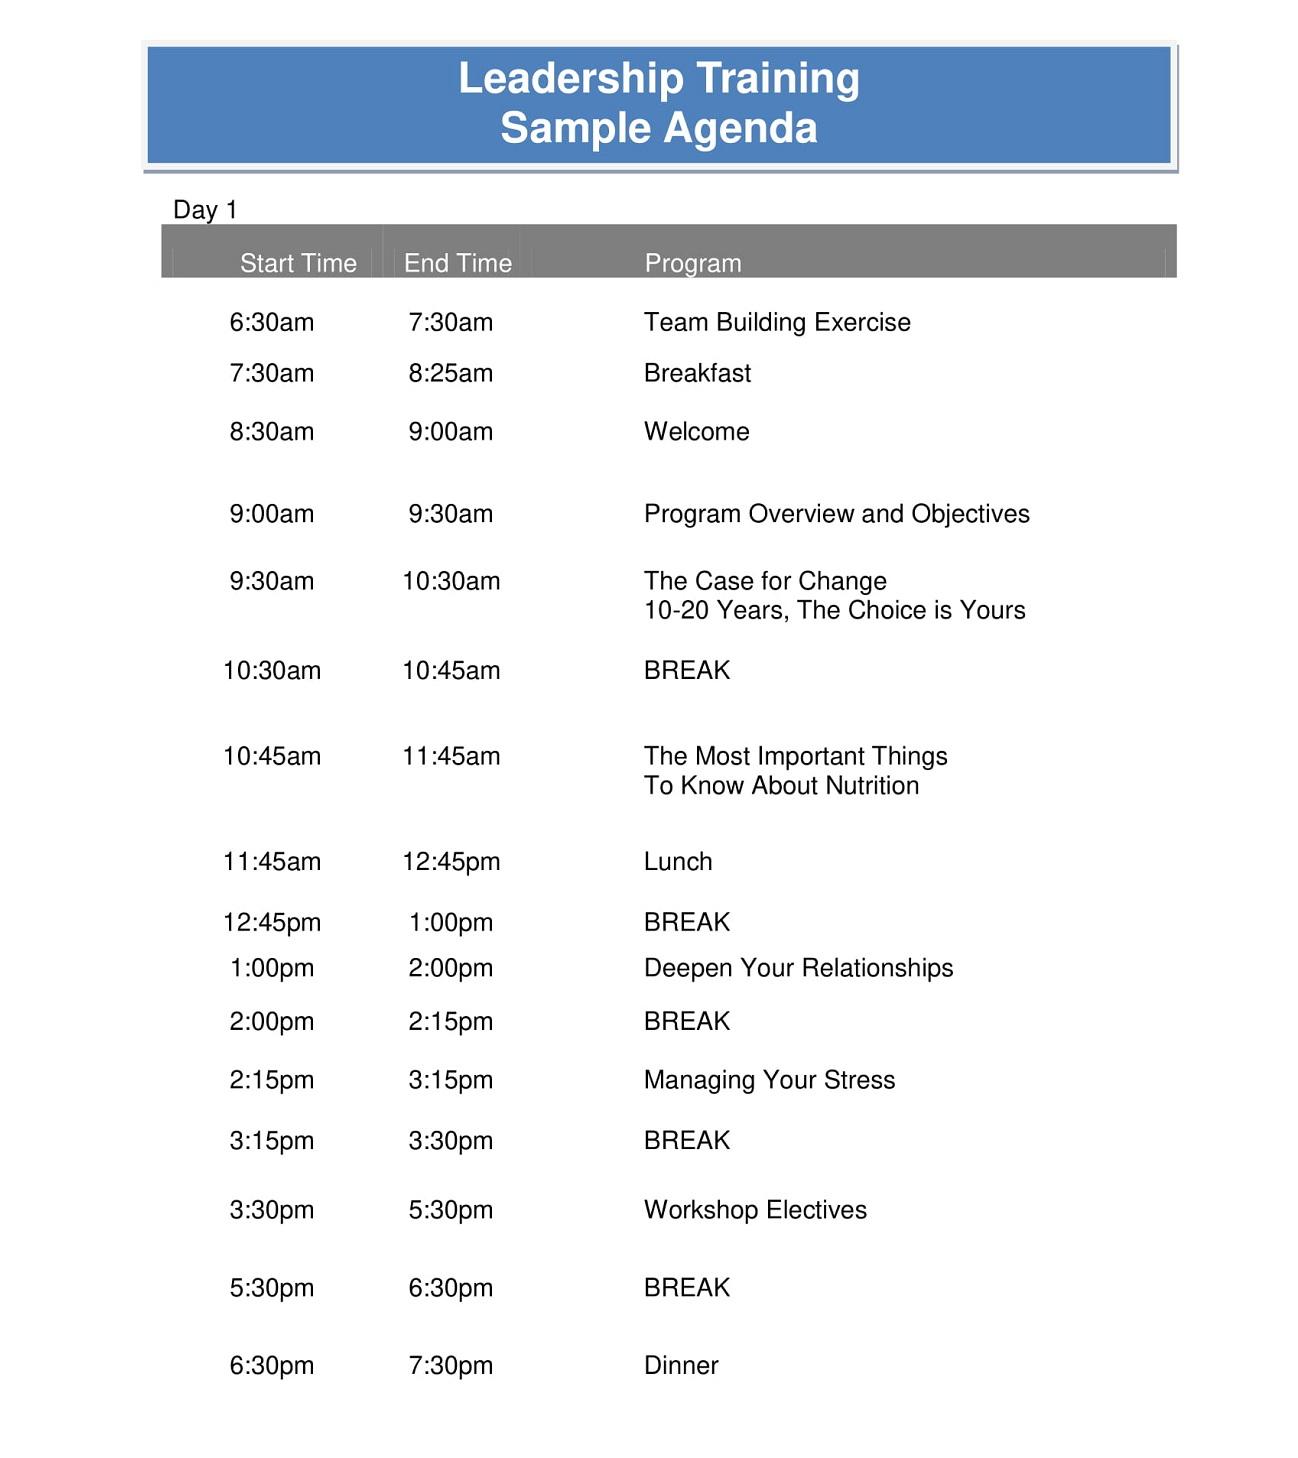 Leadership Training Agenda Sample PDF Template Microsoft Word Ppt How To Create A Pdf Layout  Full